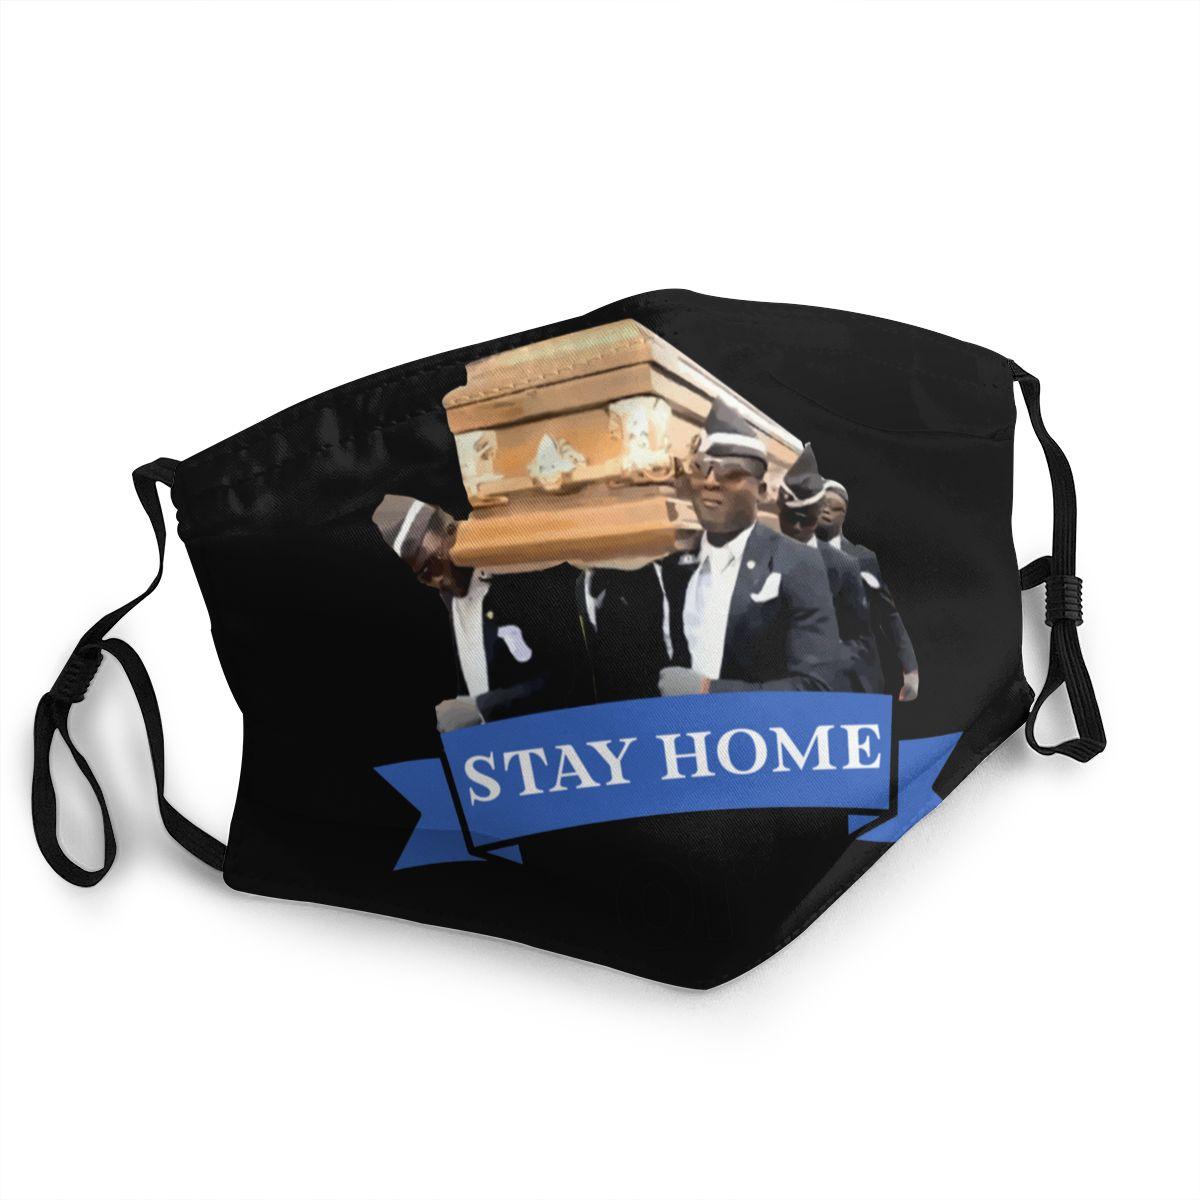 Coffin Dance Non-Disposable Face Mask Meme Funeral Pallbearers Anti Haze Dustproof Mask Protection Respirator Muffle